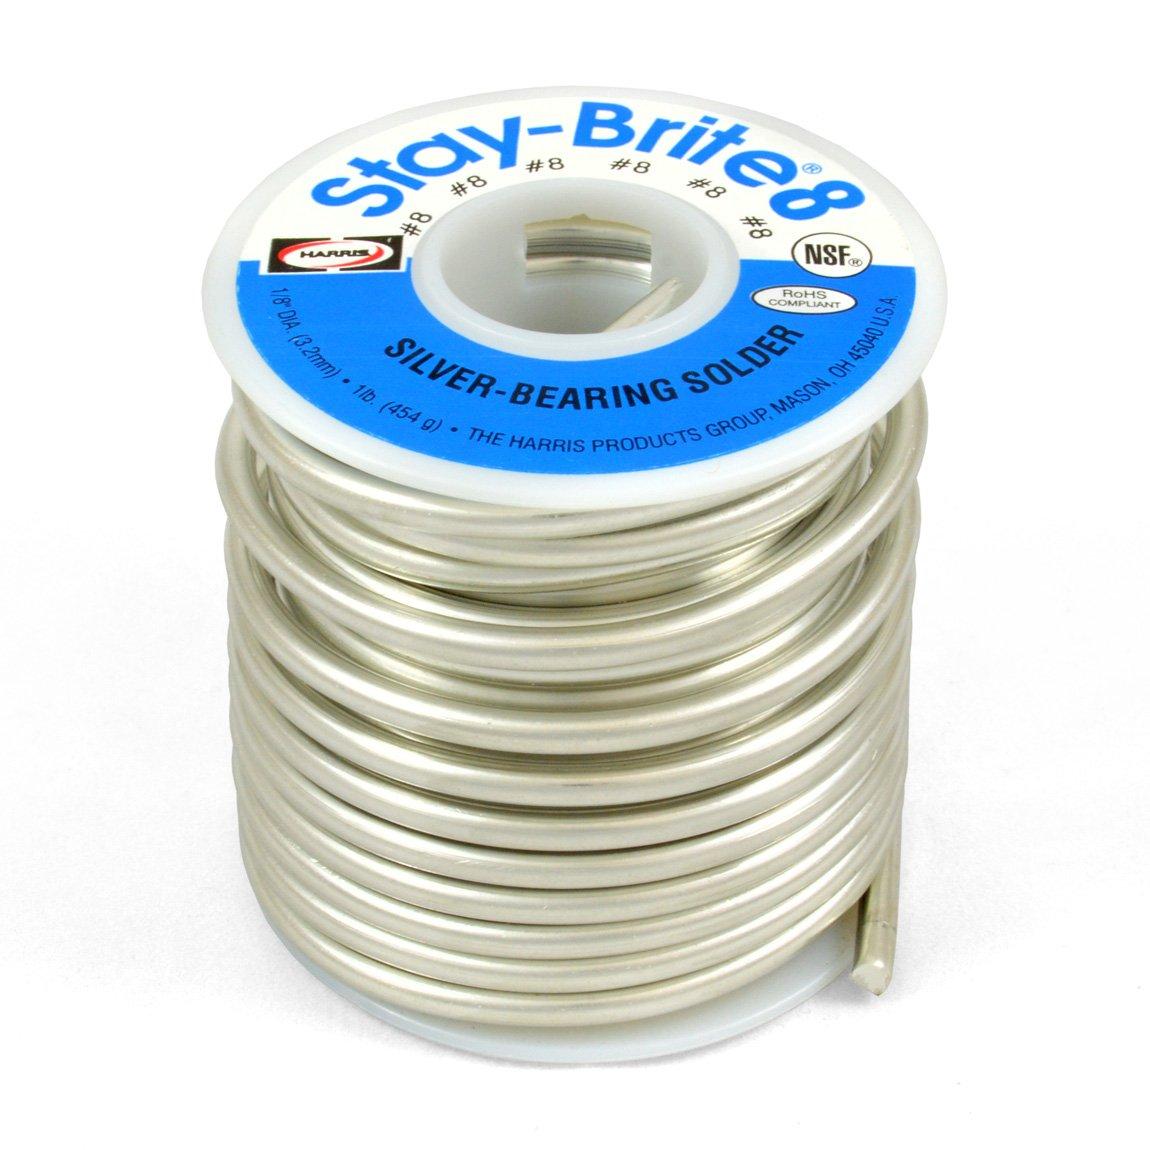 Ha Sta-brite 8 1/8'' 1#10009 (348-SB861) Category: Solder Alloys and Fluxes